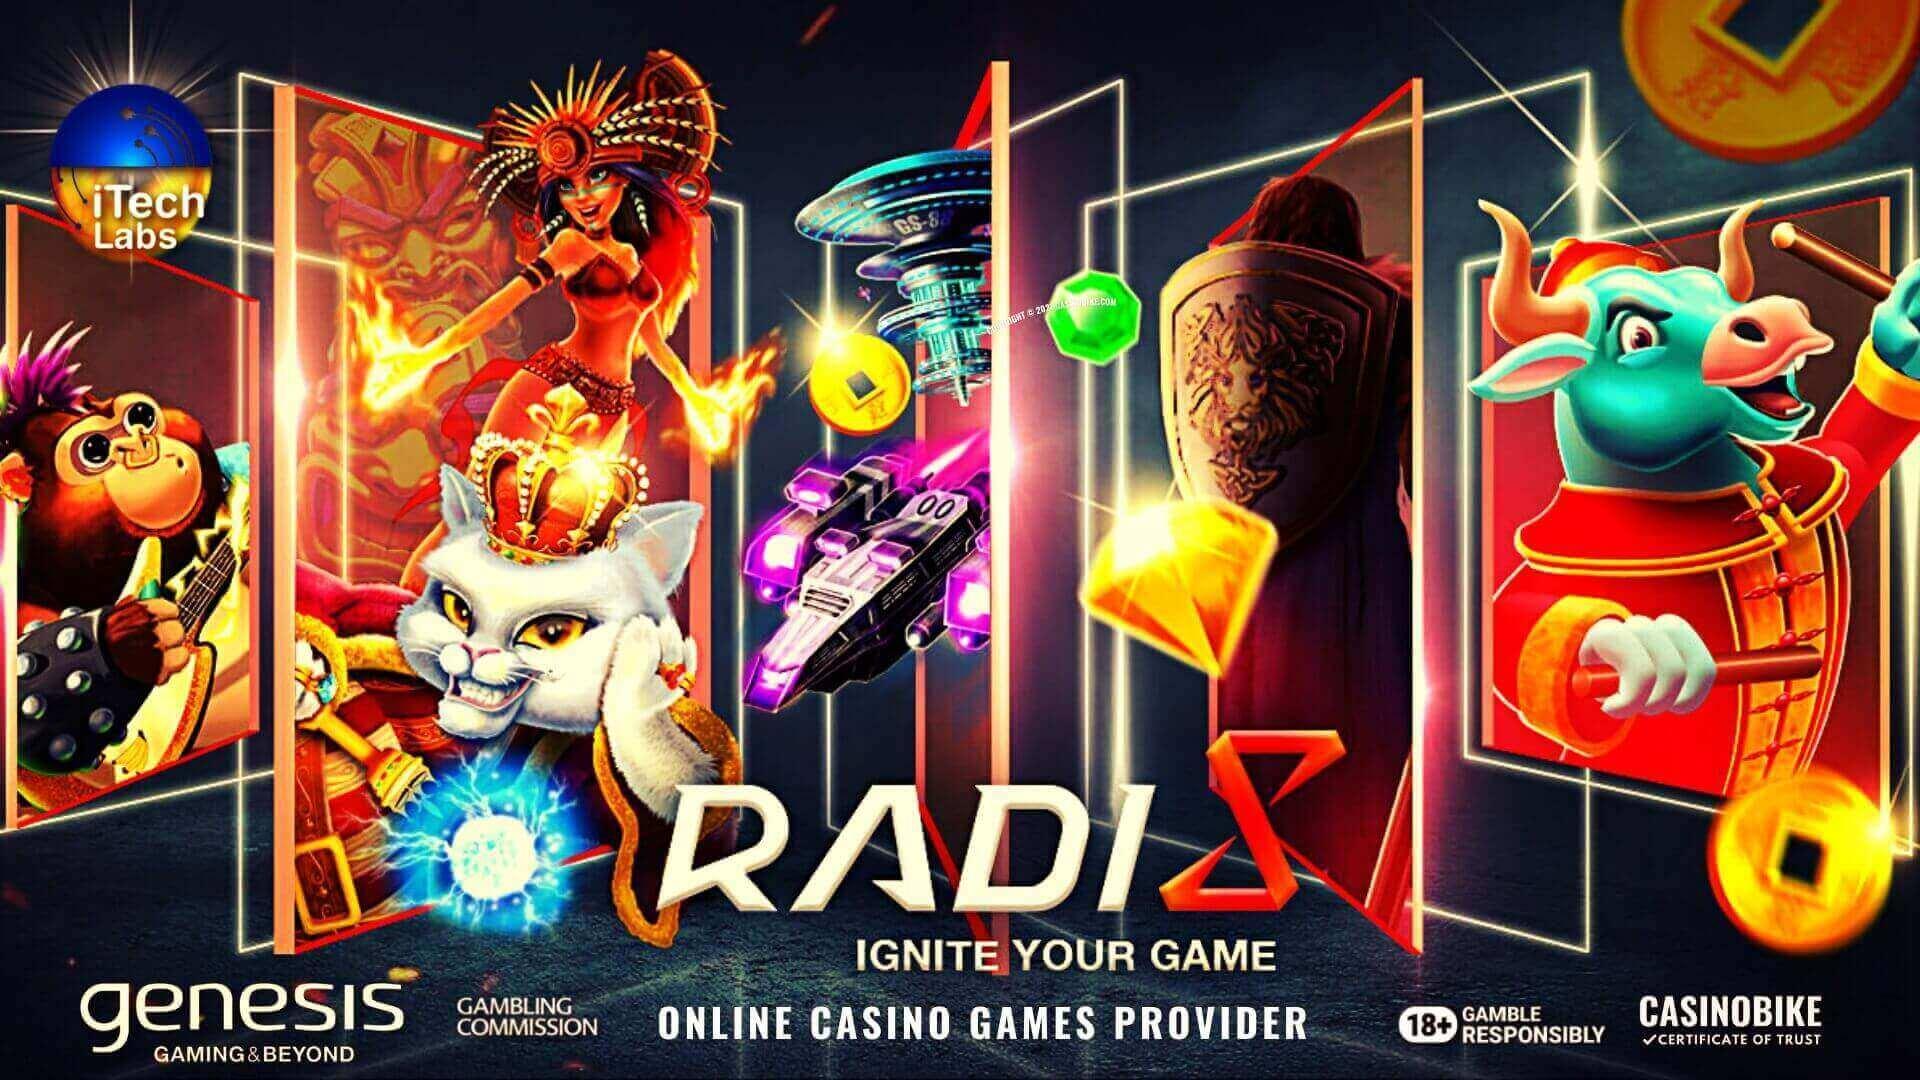 Radi8 Games Online Casino Games Provider